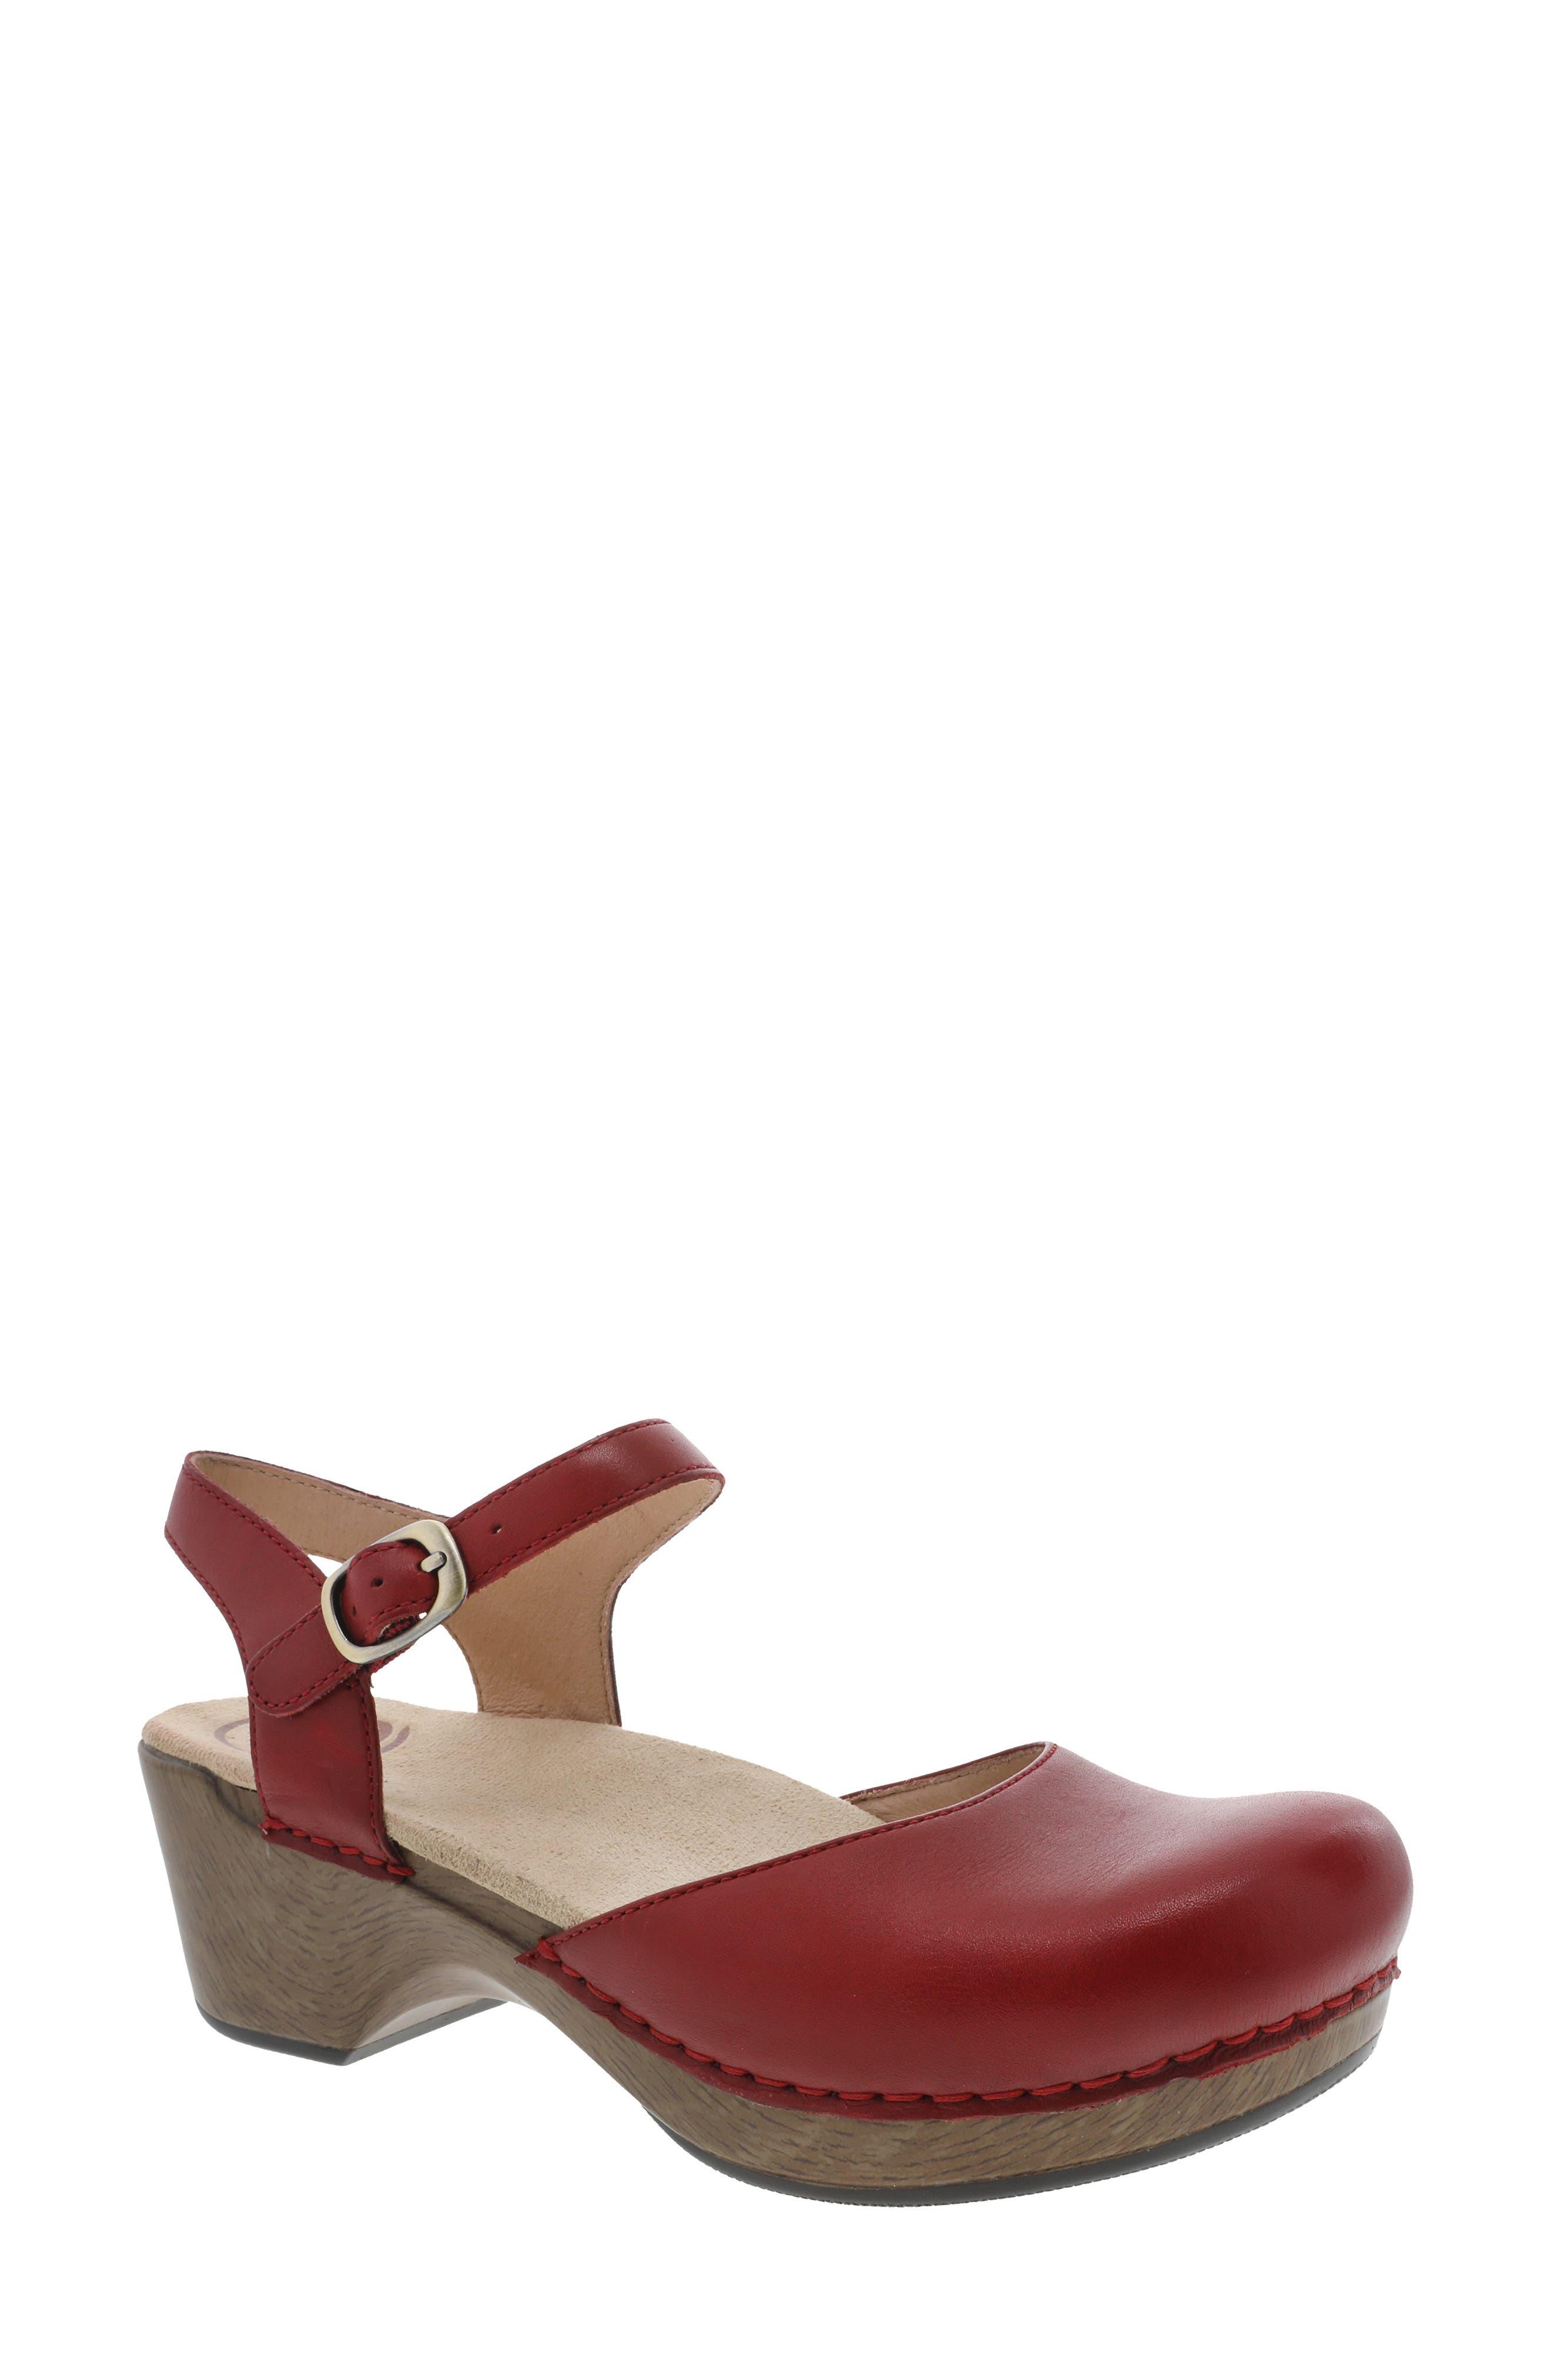 Women/'s Dansko Comfort Sandal Clog Anna Coral Leather